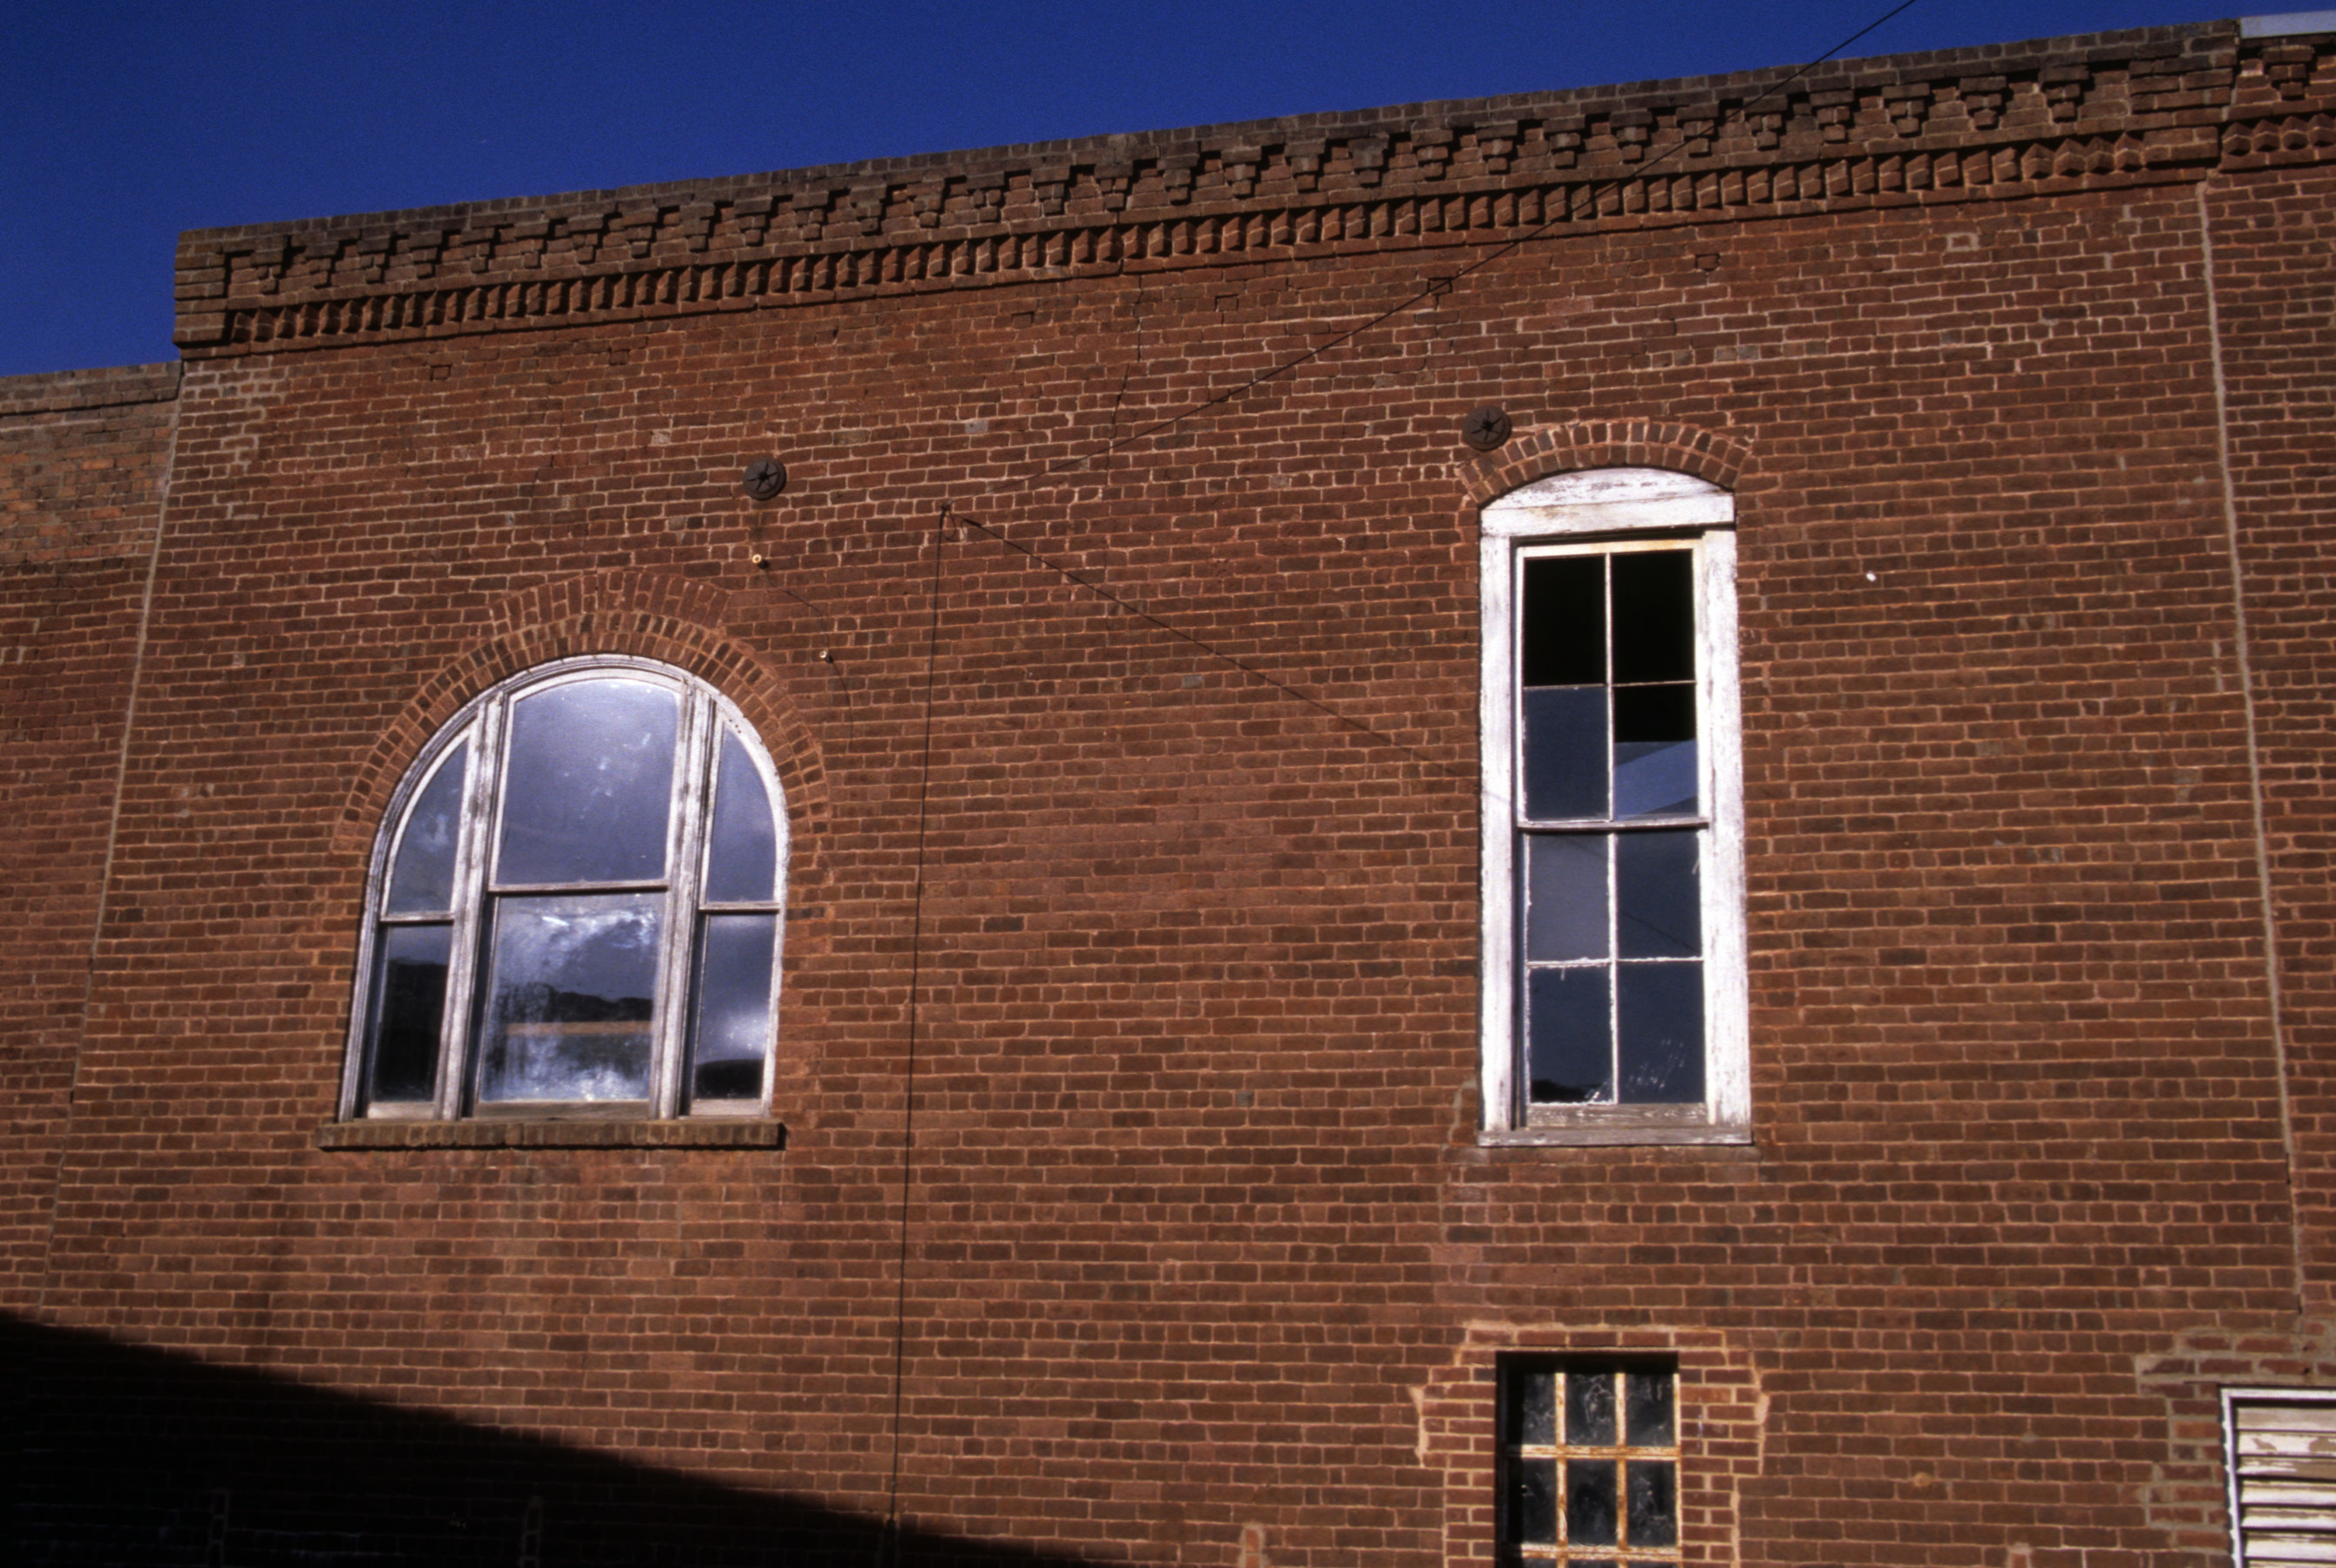 Windows, Company Store and Office, Glencoe Mill Village, Glencoealamance village